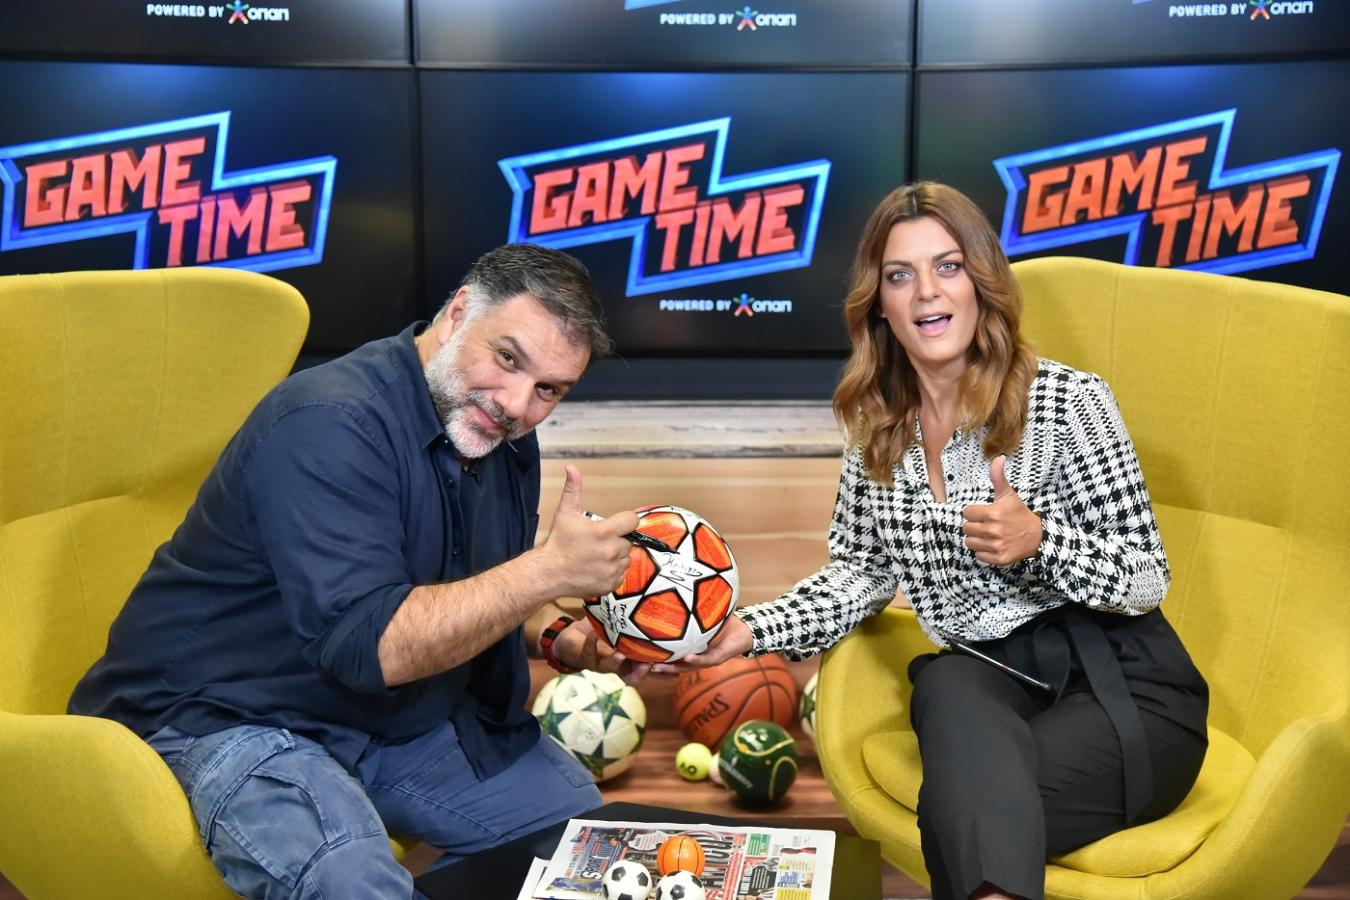 O Γρηγόρης Αρναούτογλου δείχνει τις ποδοσφαιρικές του γνώσεις στο Game Time του ΟΠΑΠ